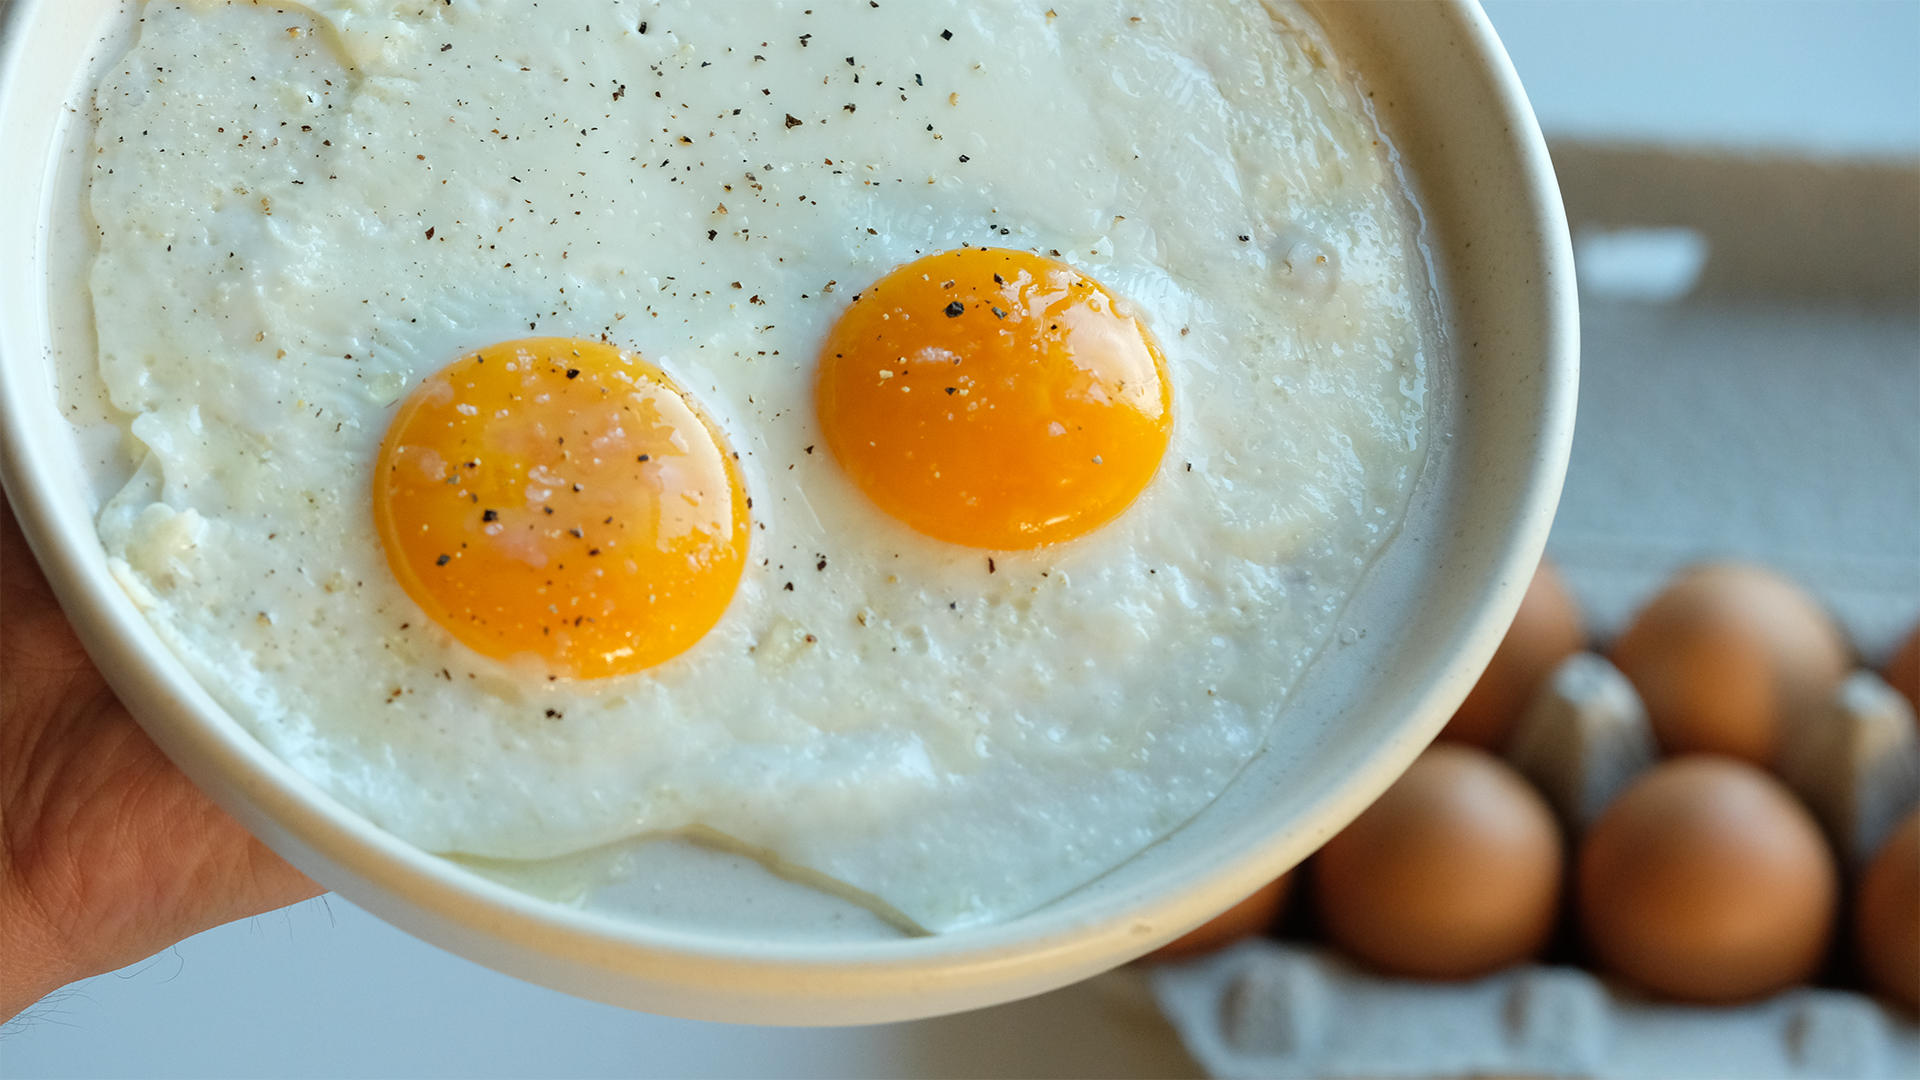 42% water, 33% fats (lipids), 17% proteins, & 2% vitamins